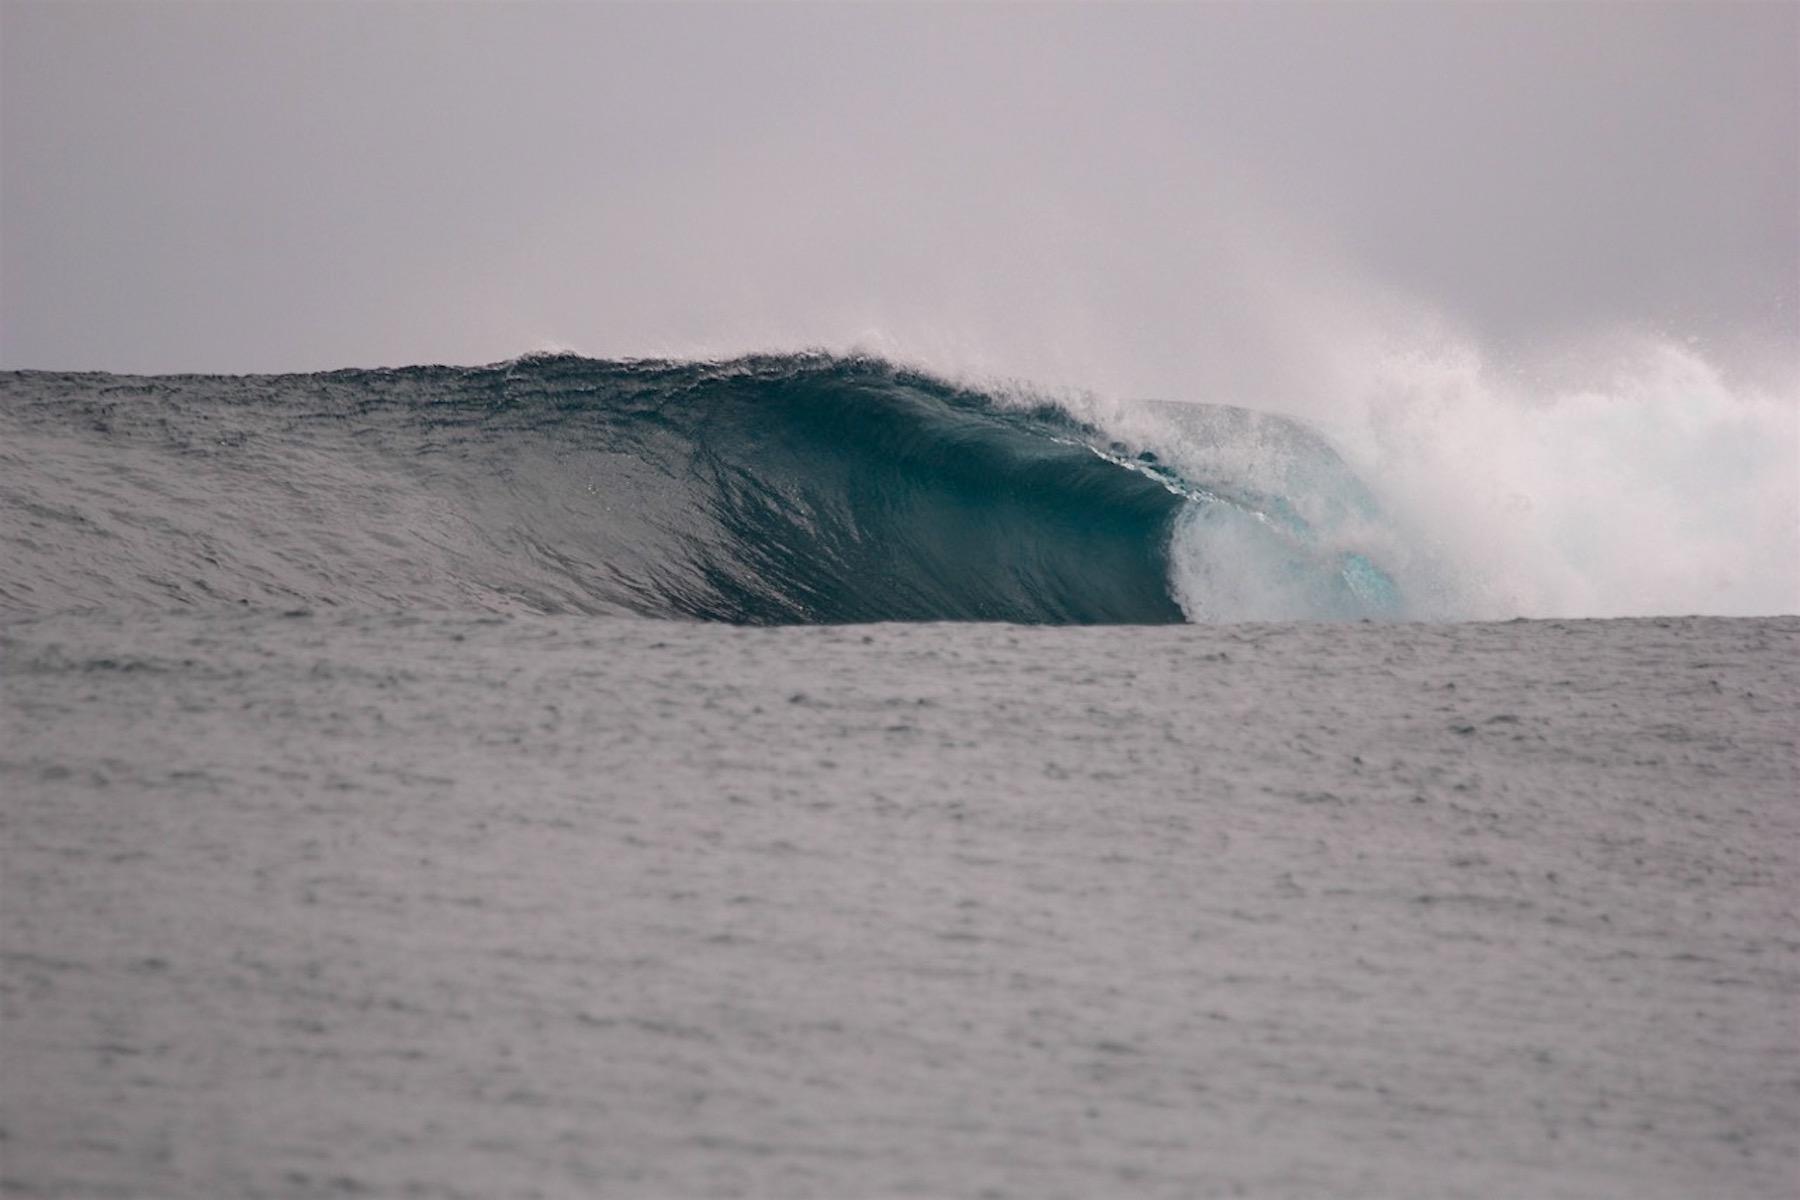 resort latitude zero, surfing, waves, report, tropical, Indonesia